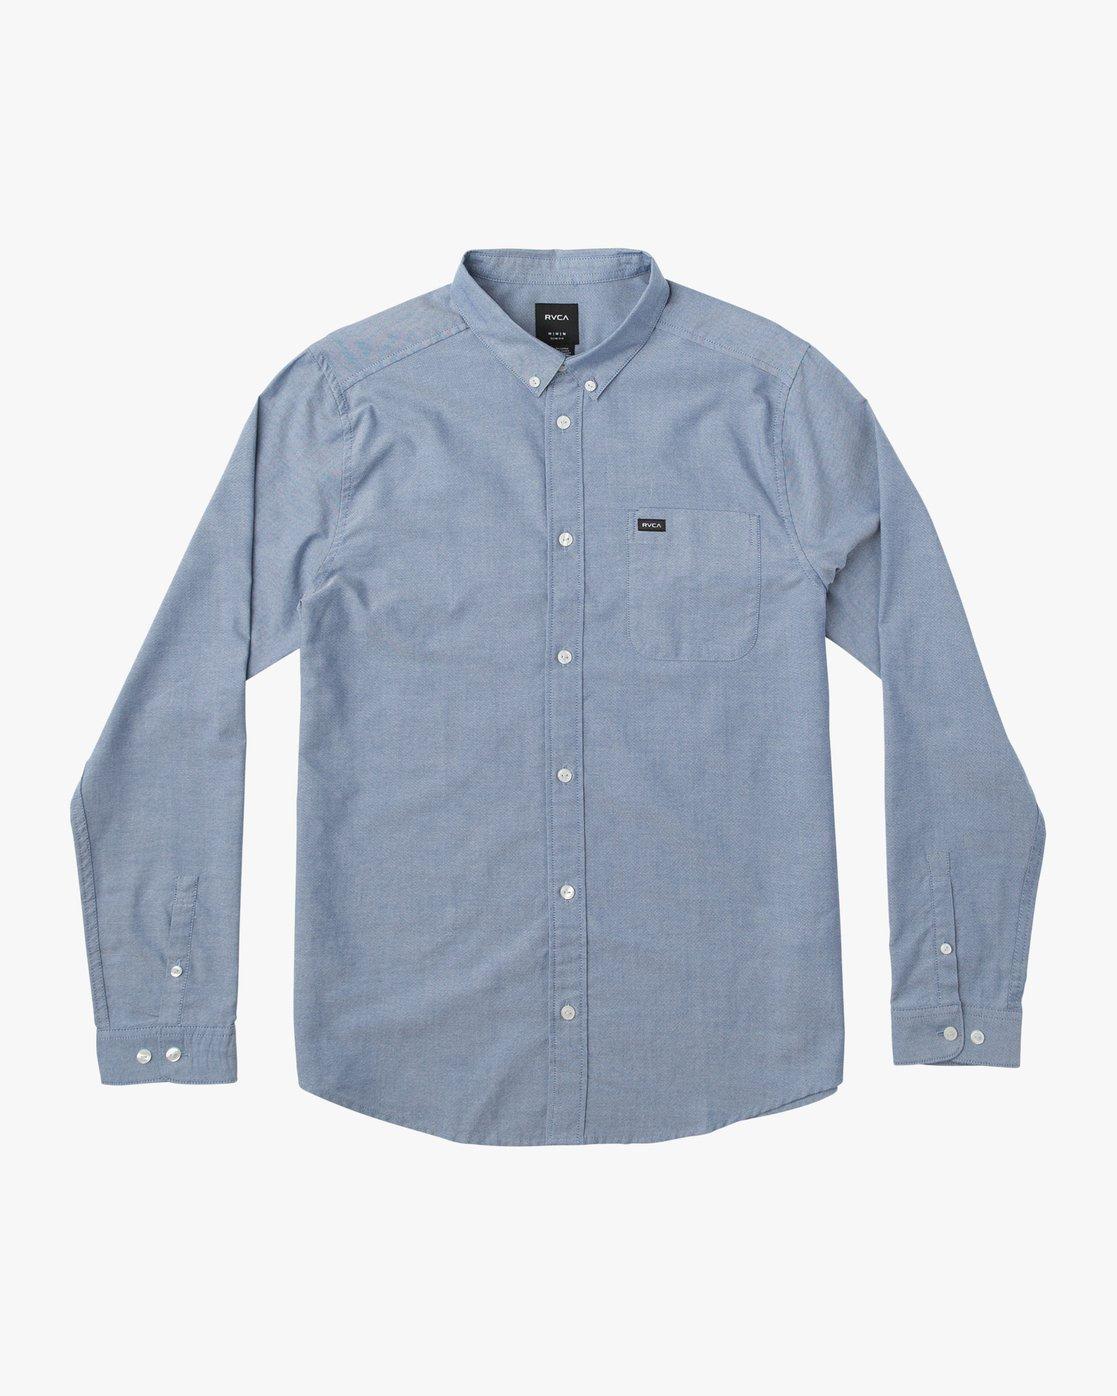 New RVCA That/'ll Do LS Oxford Shirt White